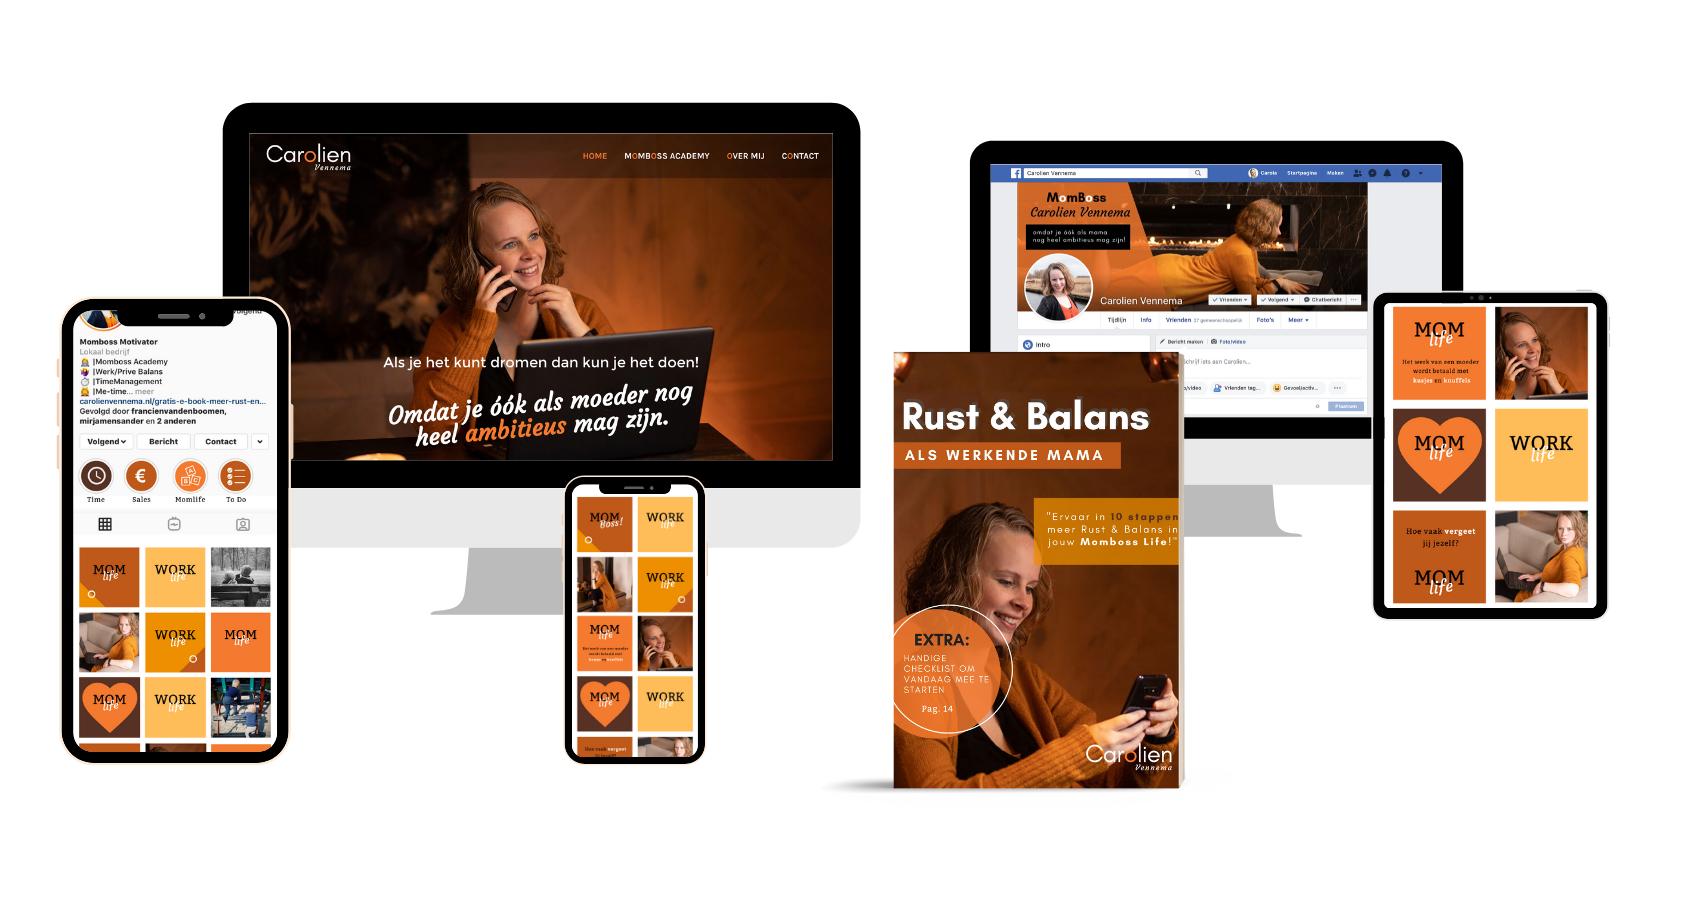 Brand Expert Premium - Personal Branding Carolien Vennema